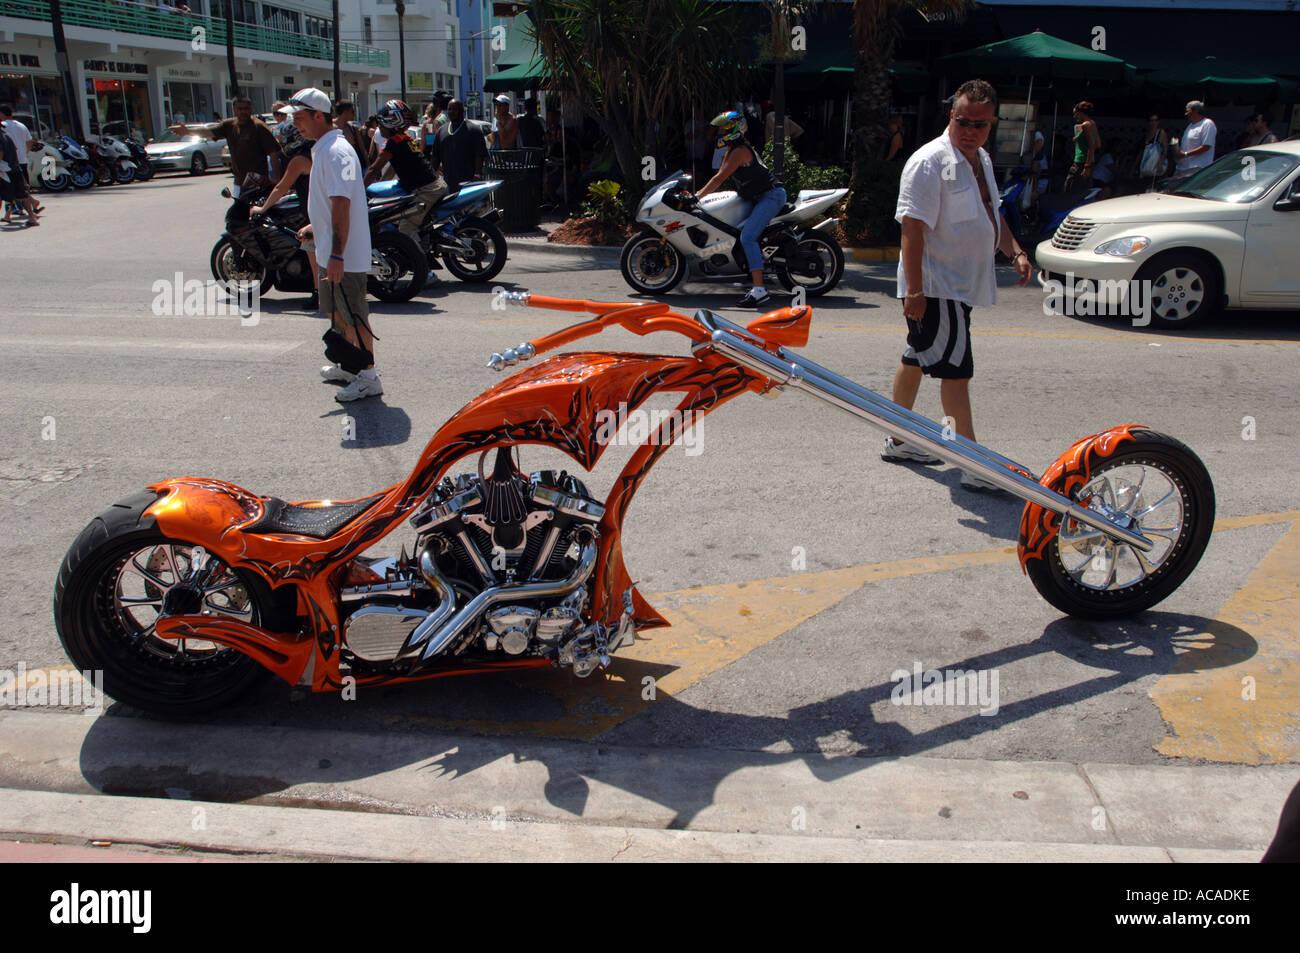 Custom motorbike, Miami, Florida, USA - Stock Image